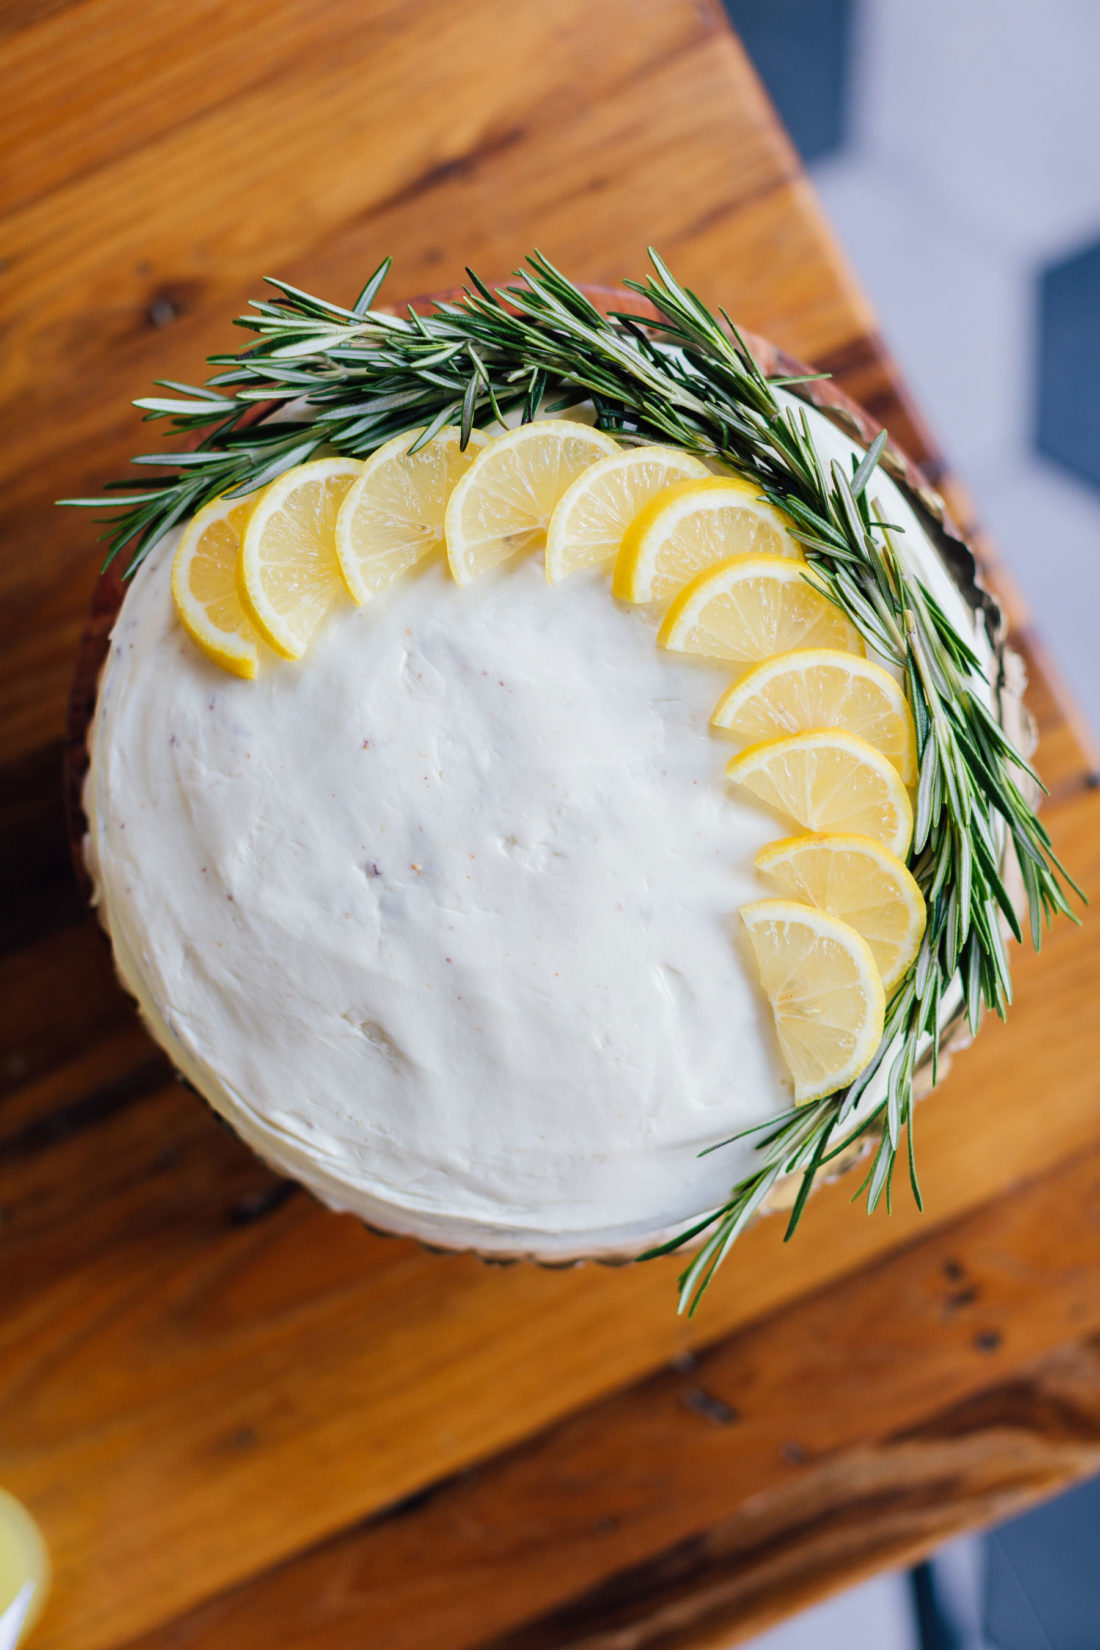 The cake at blogger Eva Amurri's Baby Sprinkle